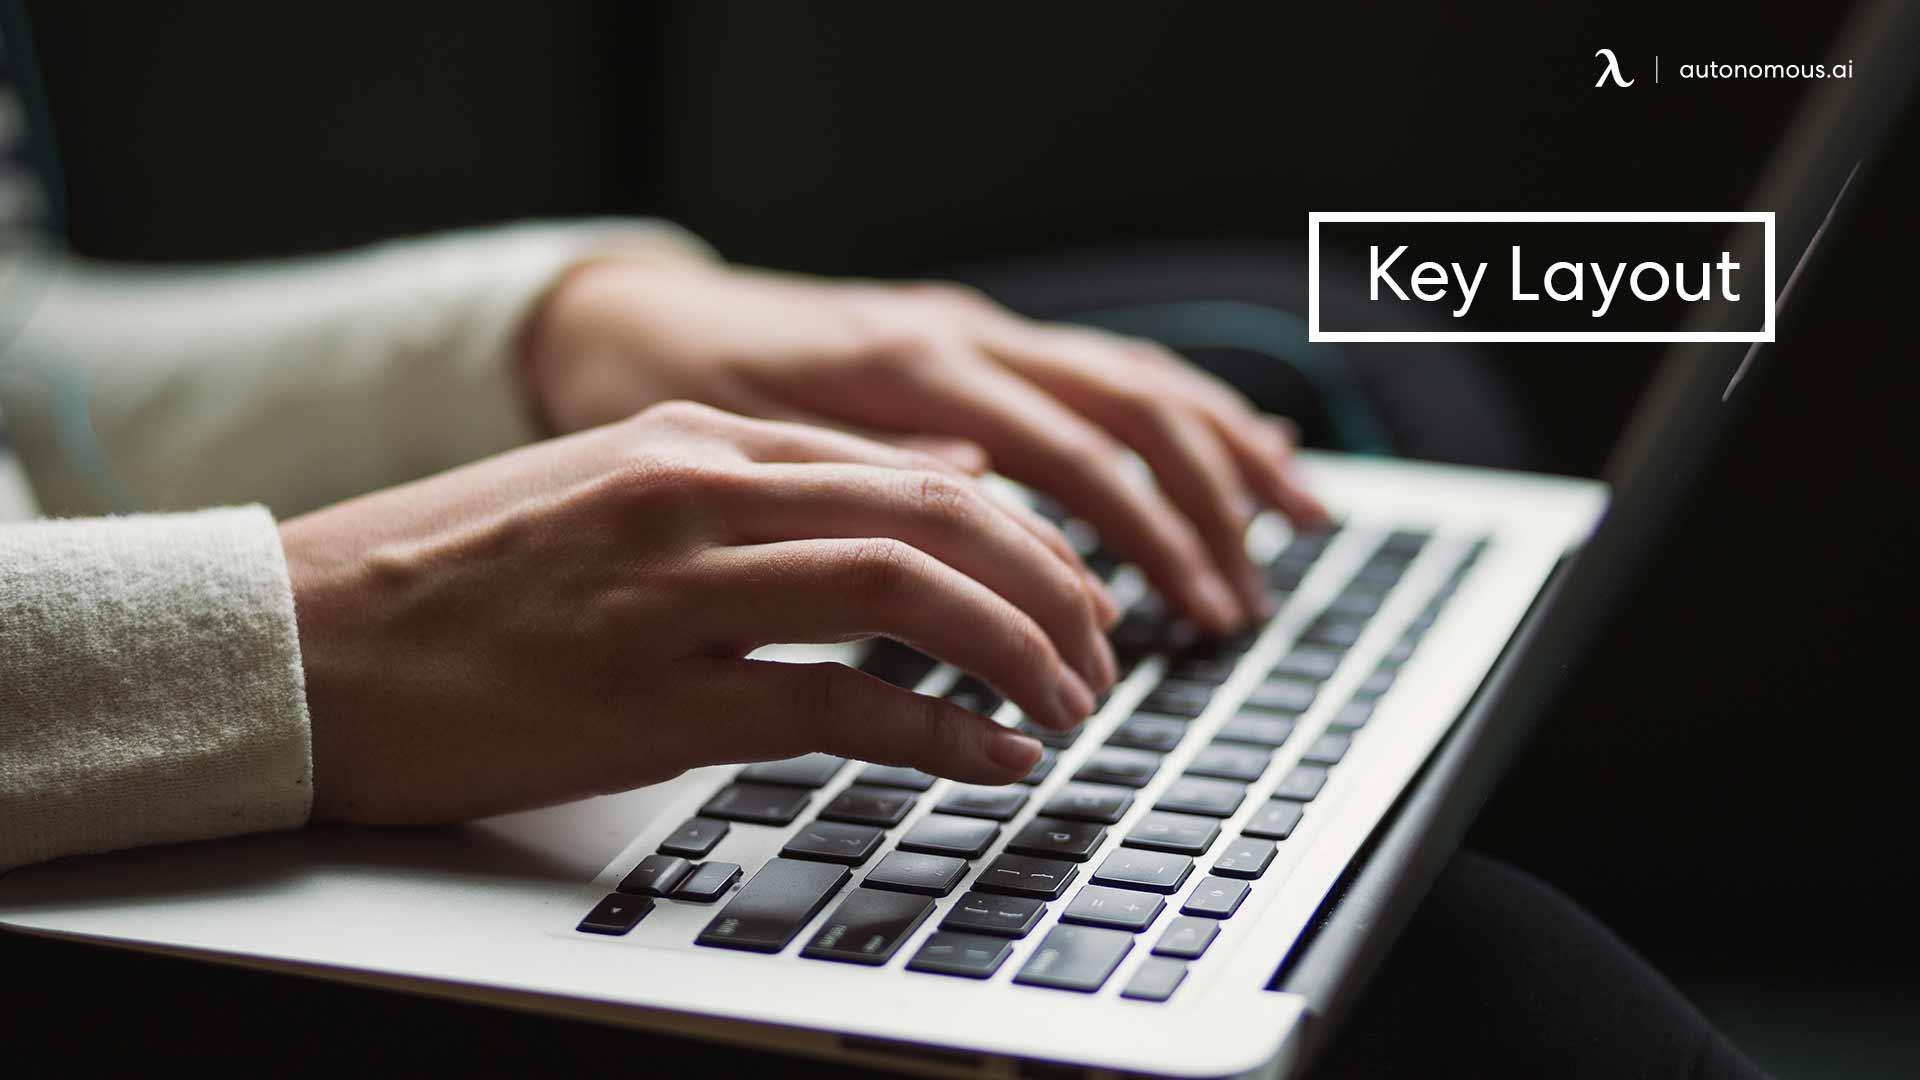 Photo of ergonomic keyboard key layout